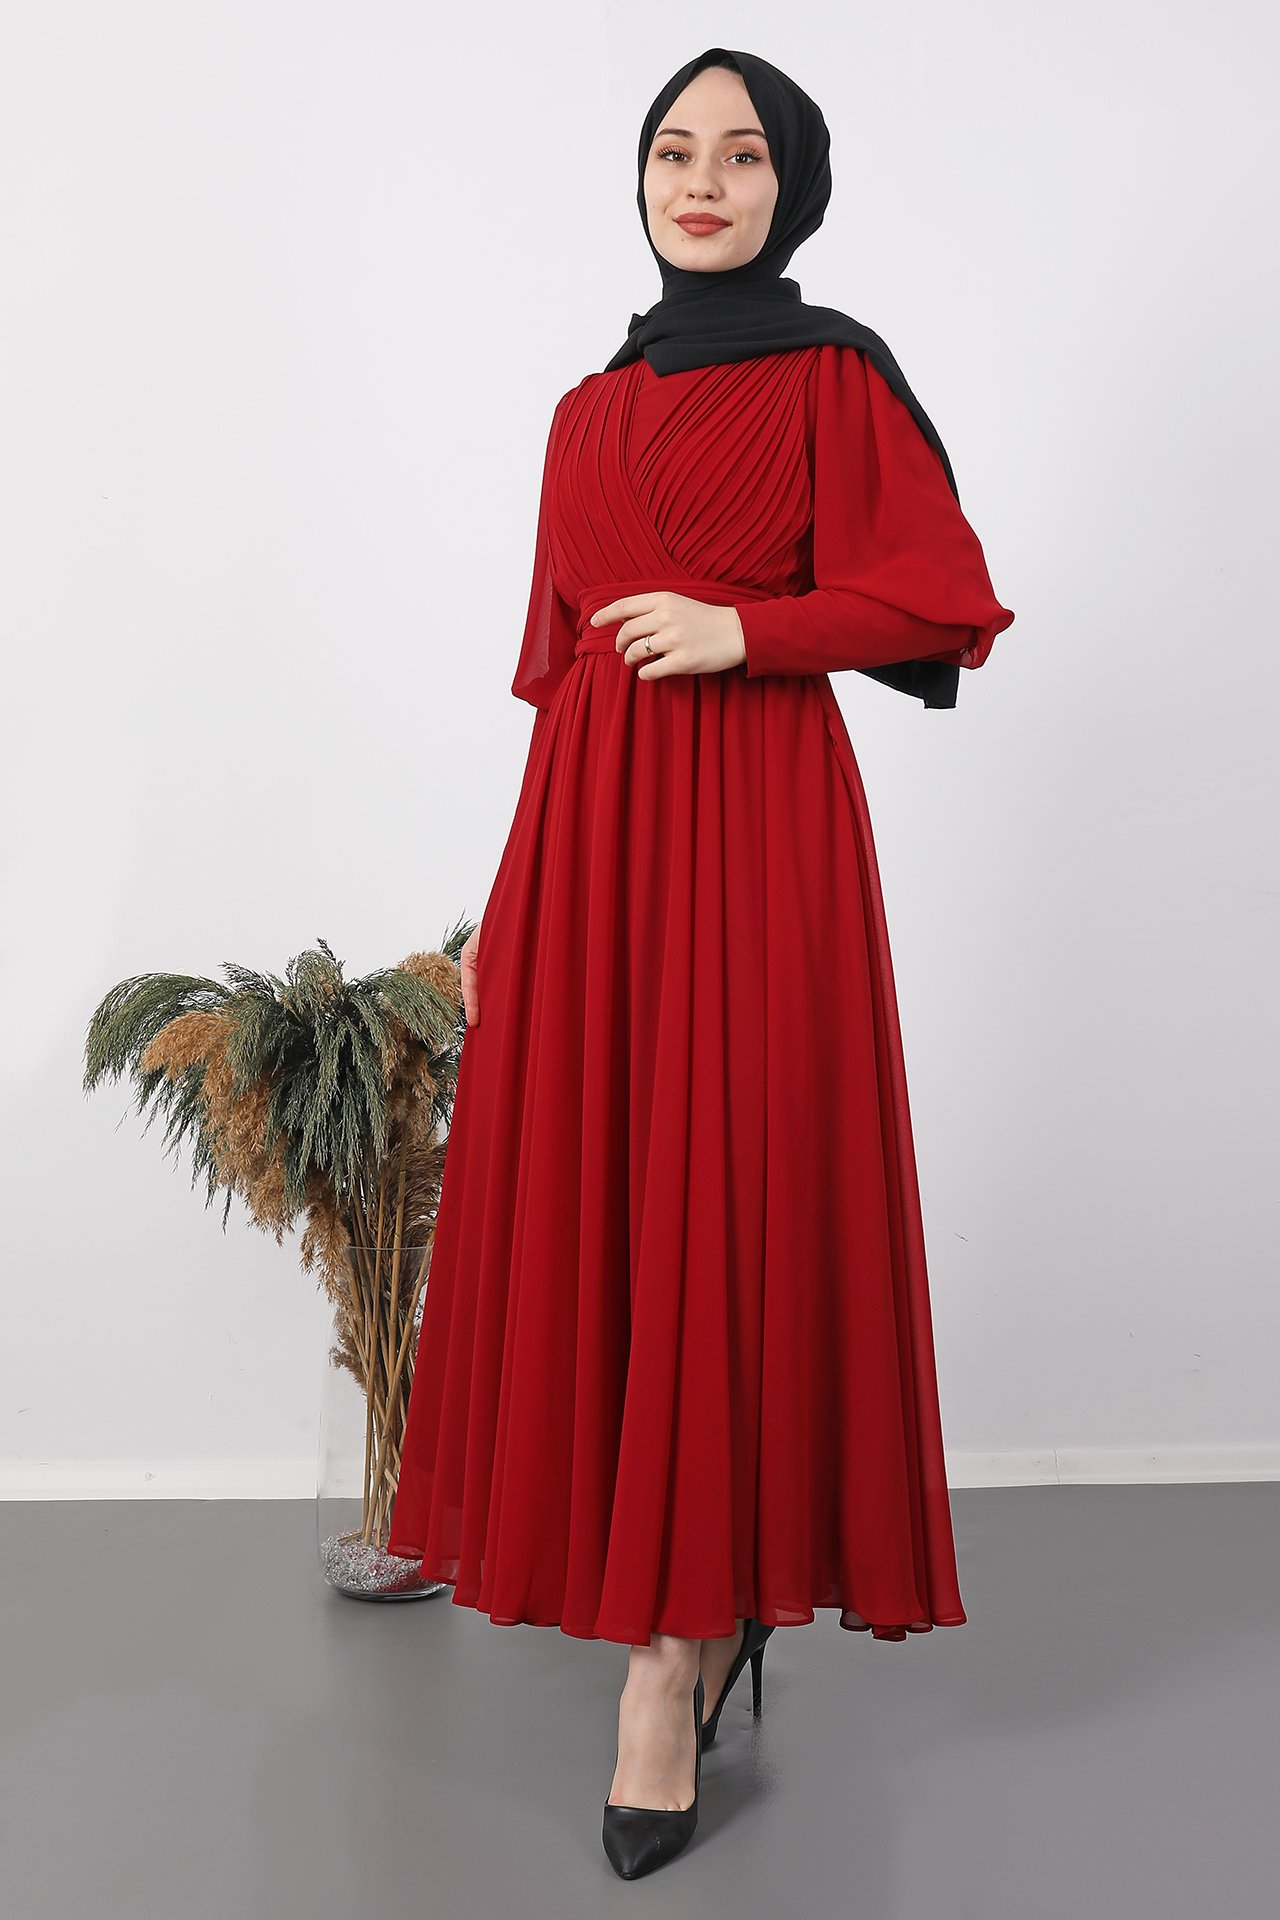 GİZAGİYİM - Kol Manşetli Piliseli Elbise Bordo